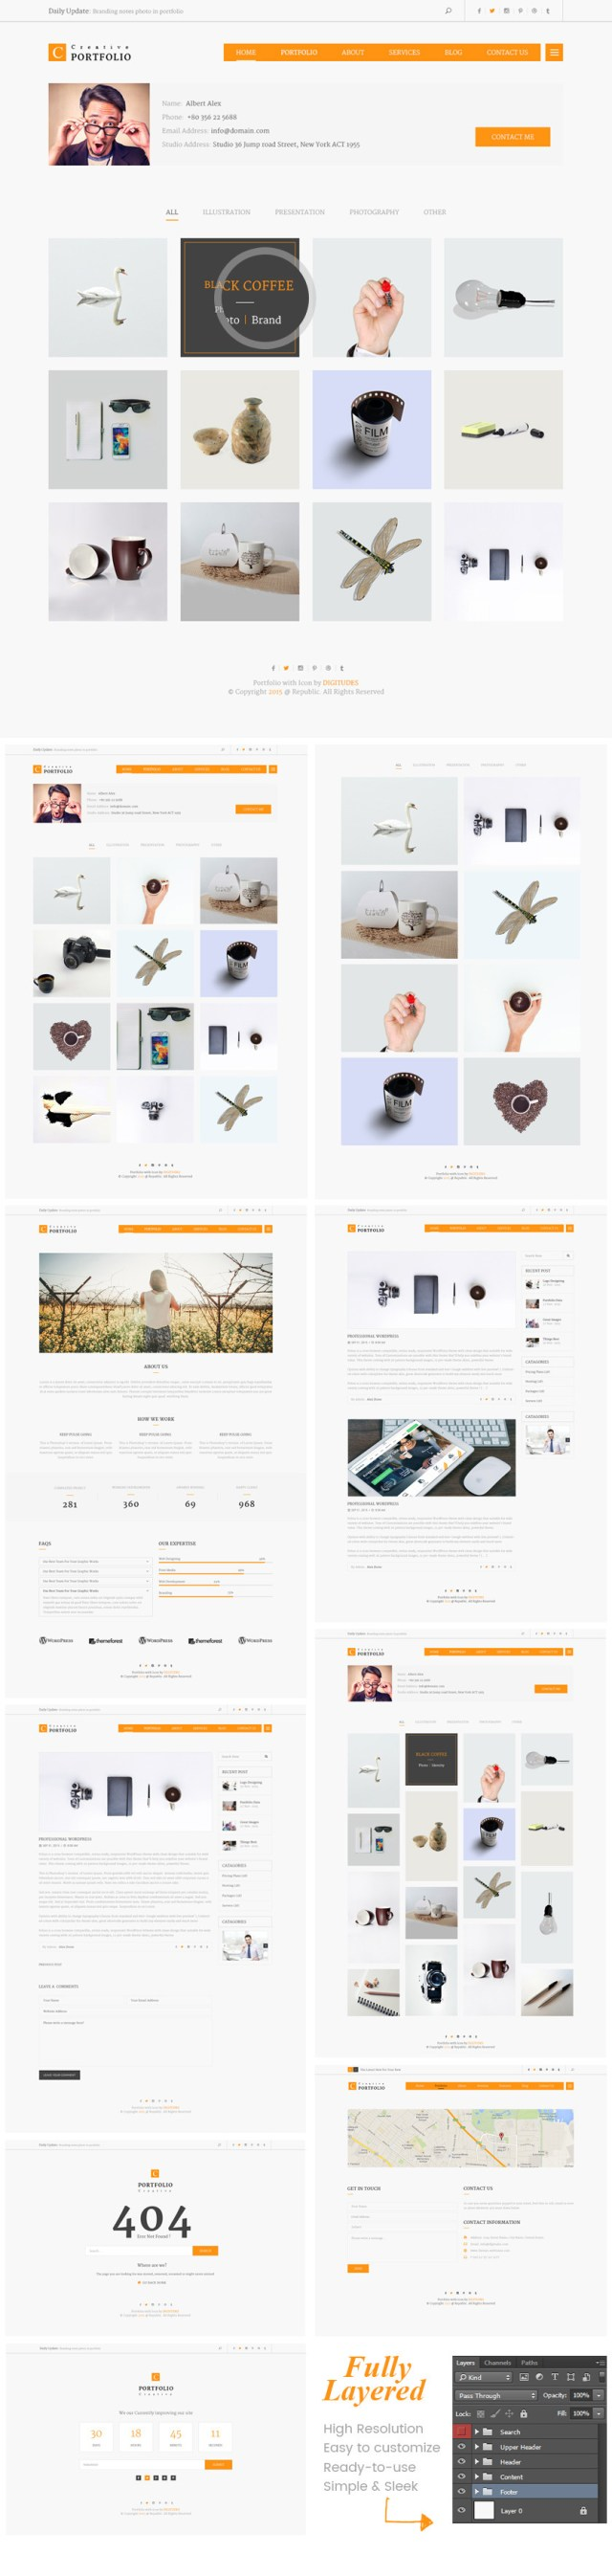 Free-Creative-Portfolio-PSD-Template